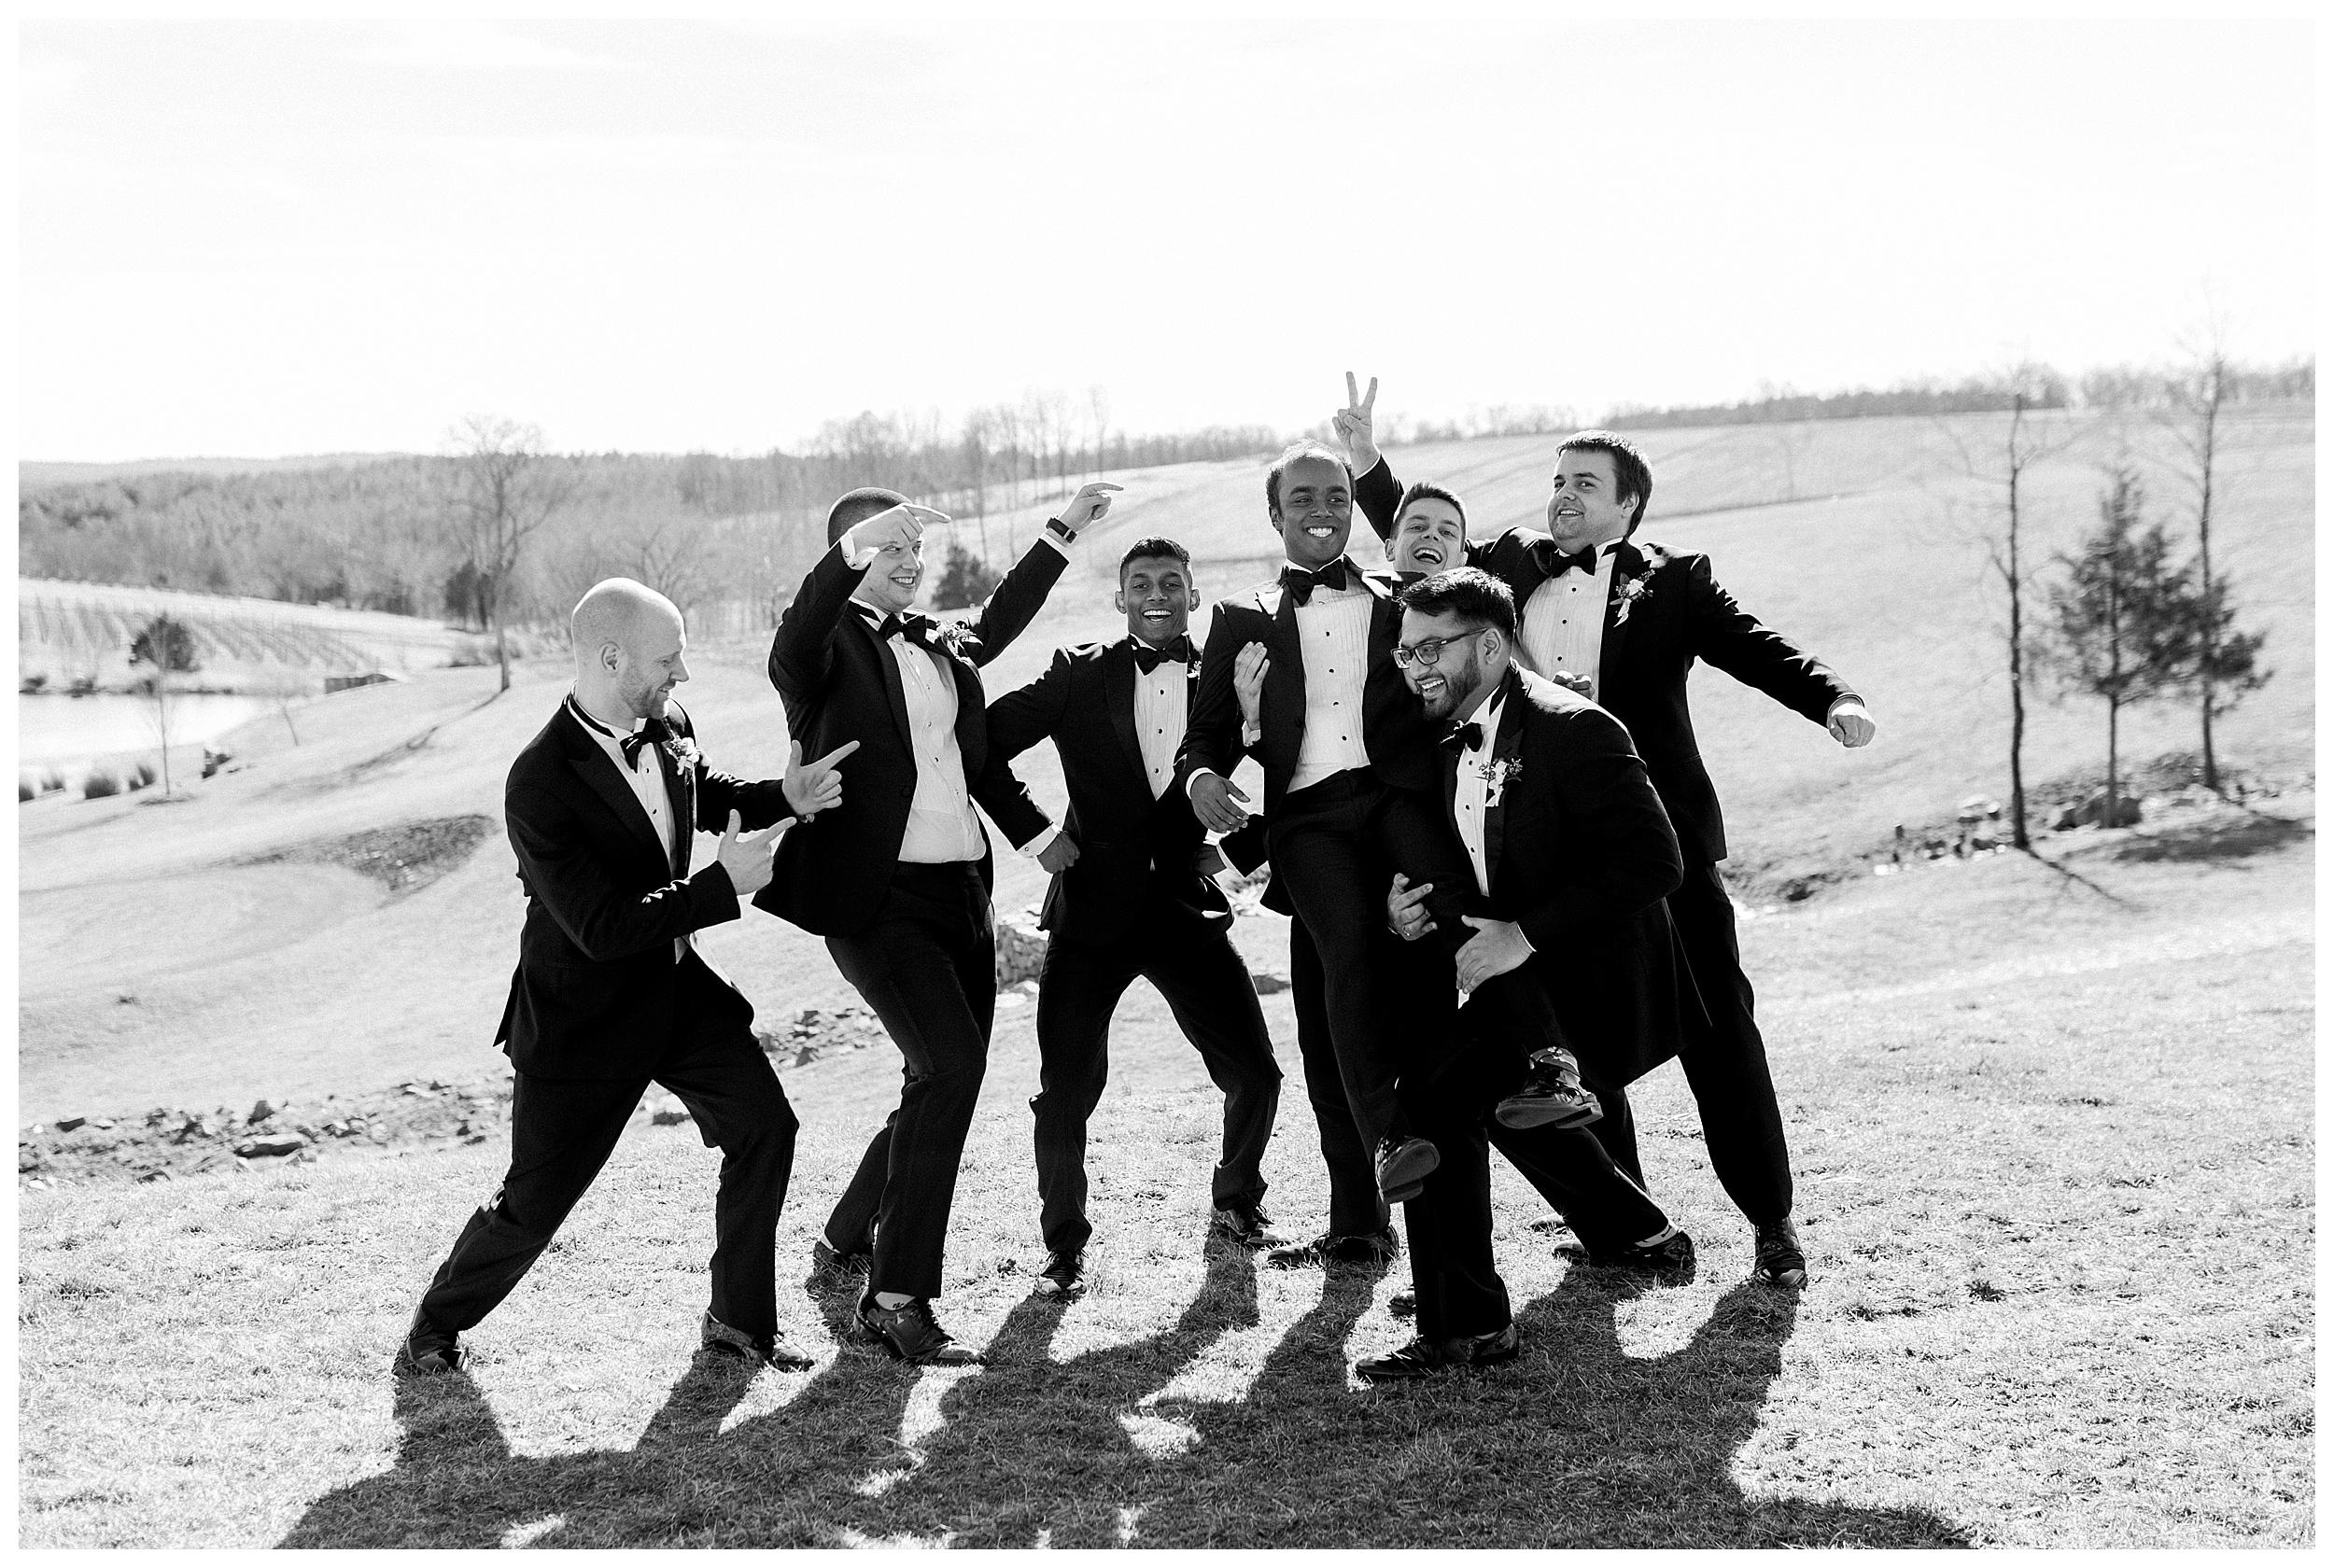 Stone Tower Winery Wedding | Virginia Winter Wedding | VA Wedding Photographer Kir Tuben_0069.jpg